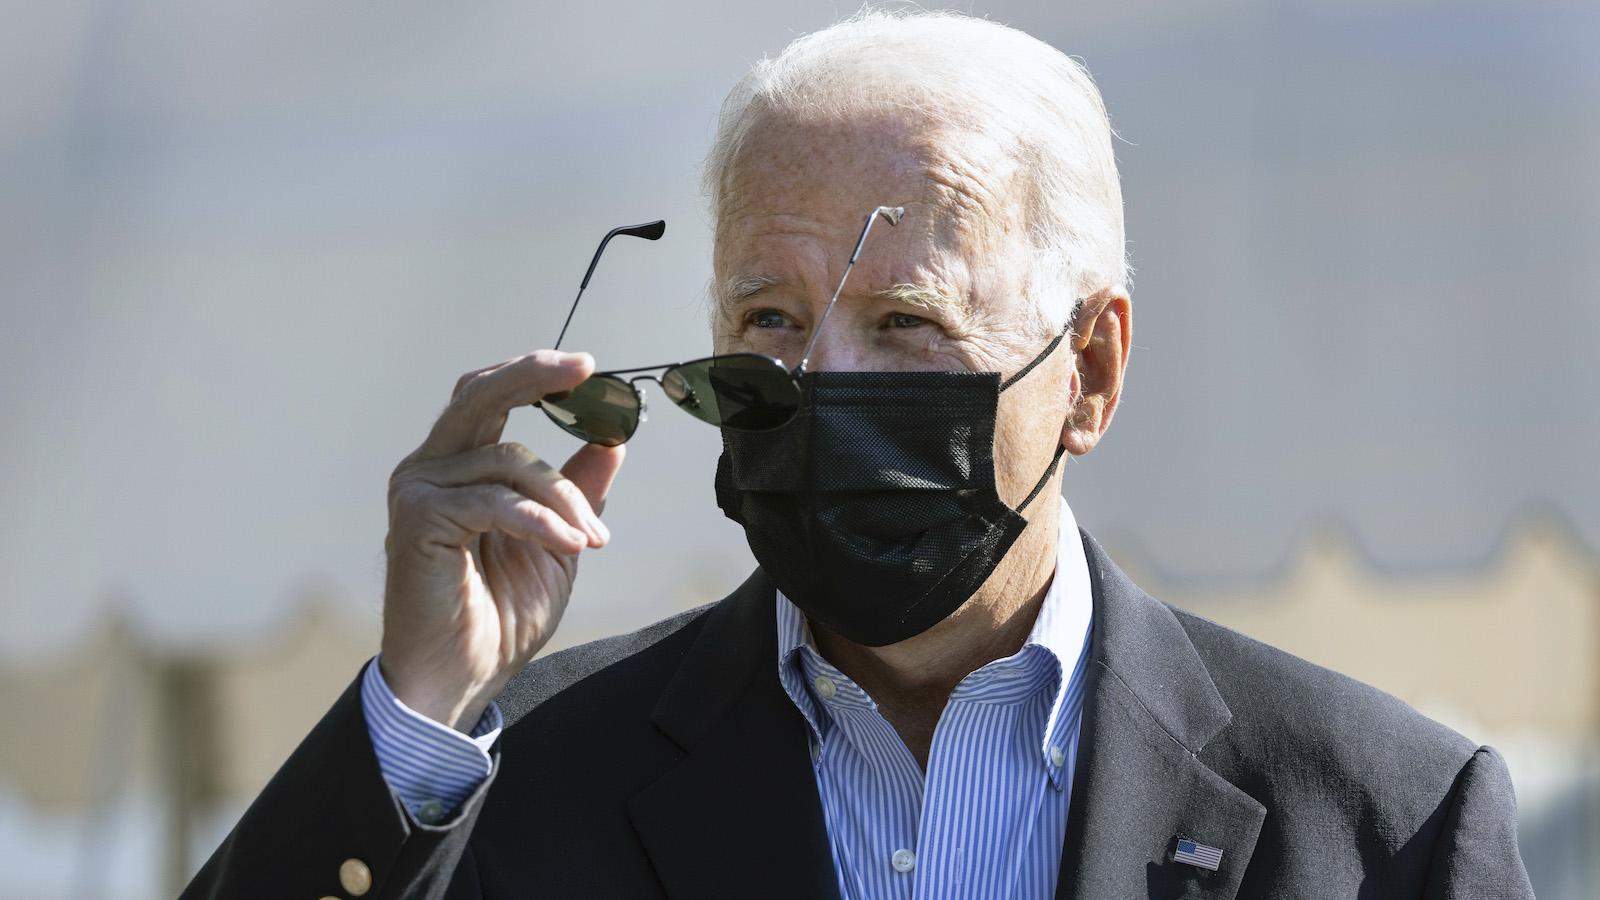 Joe Biden puts on his sunglasses under the blazing sun